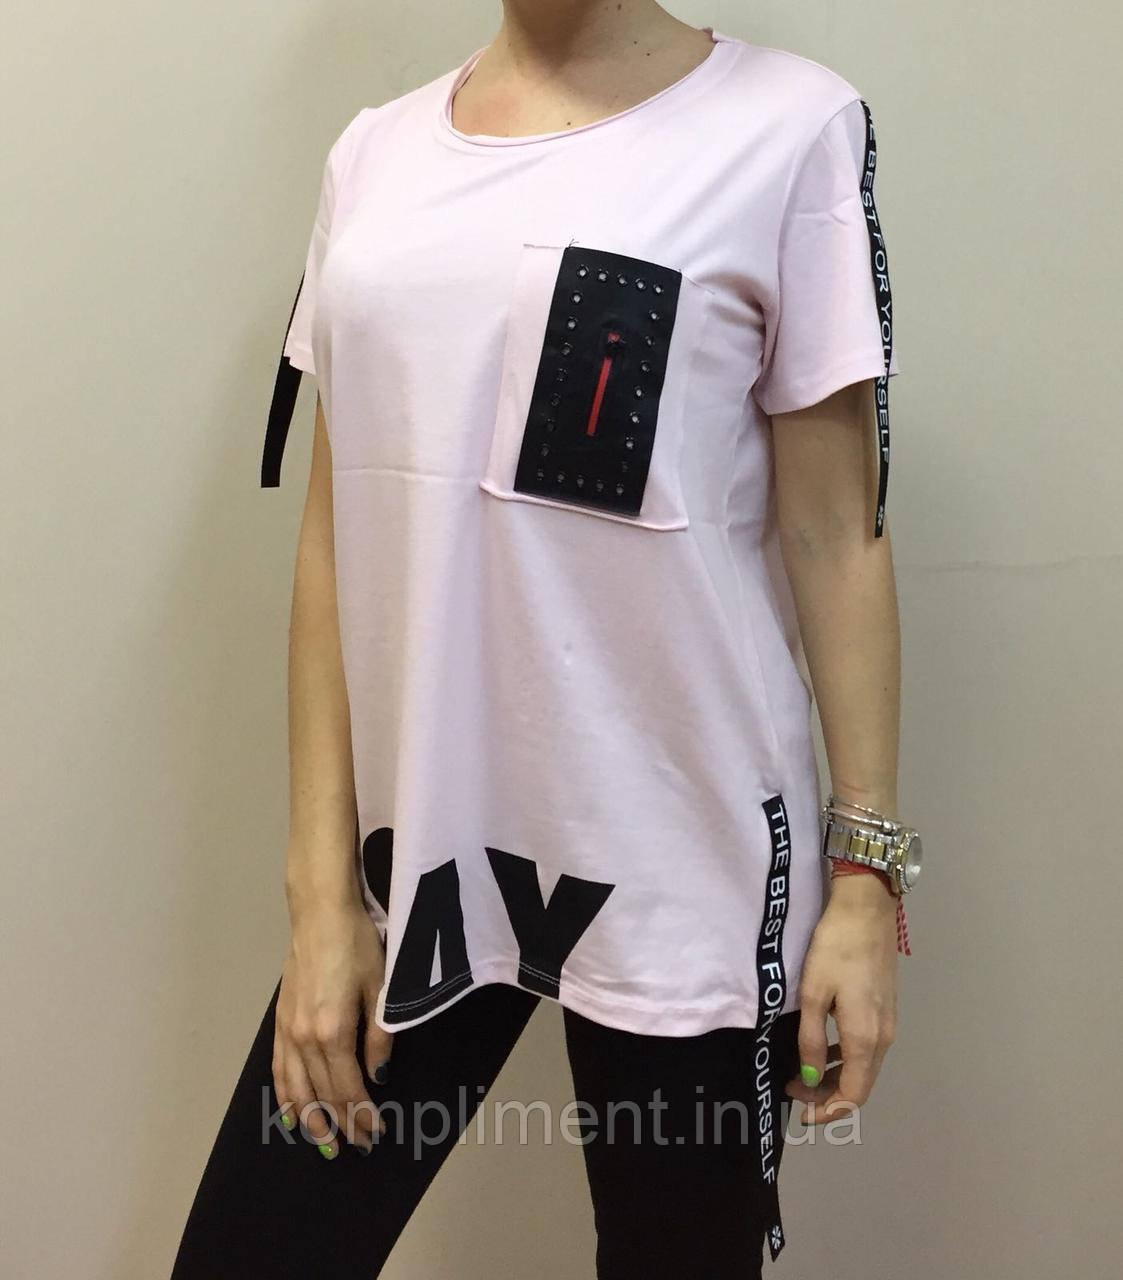 Летняя женская турецкая футболка 48-50 розовая